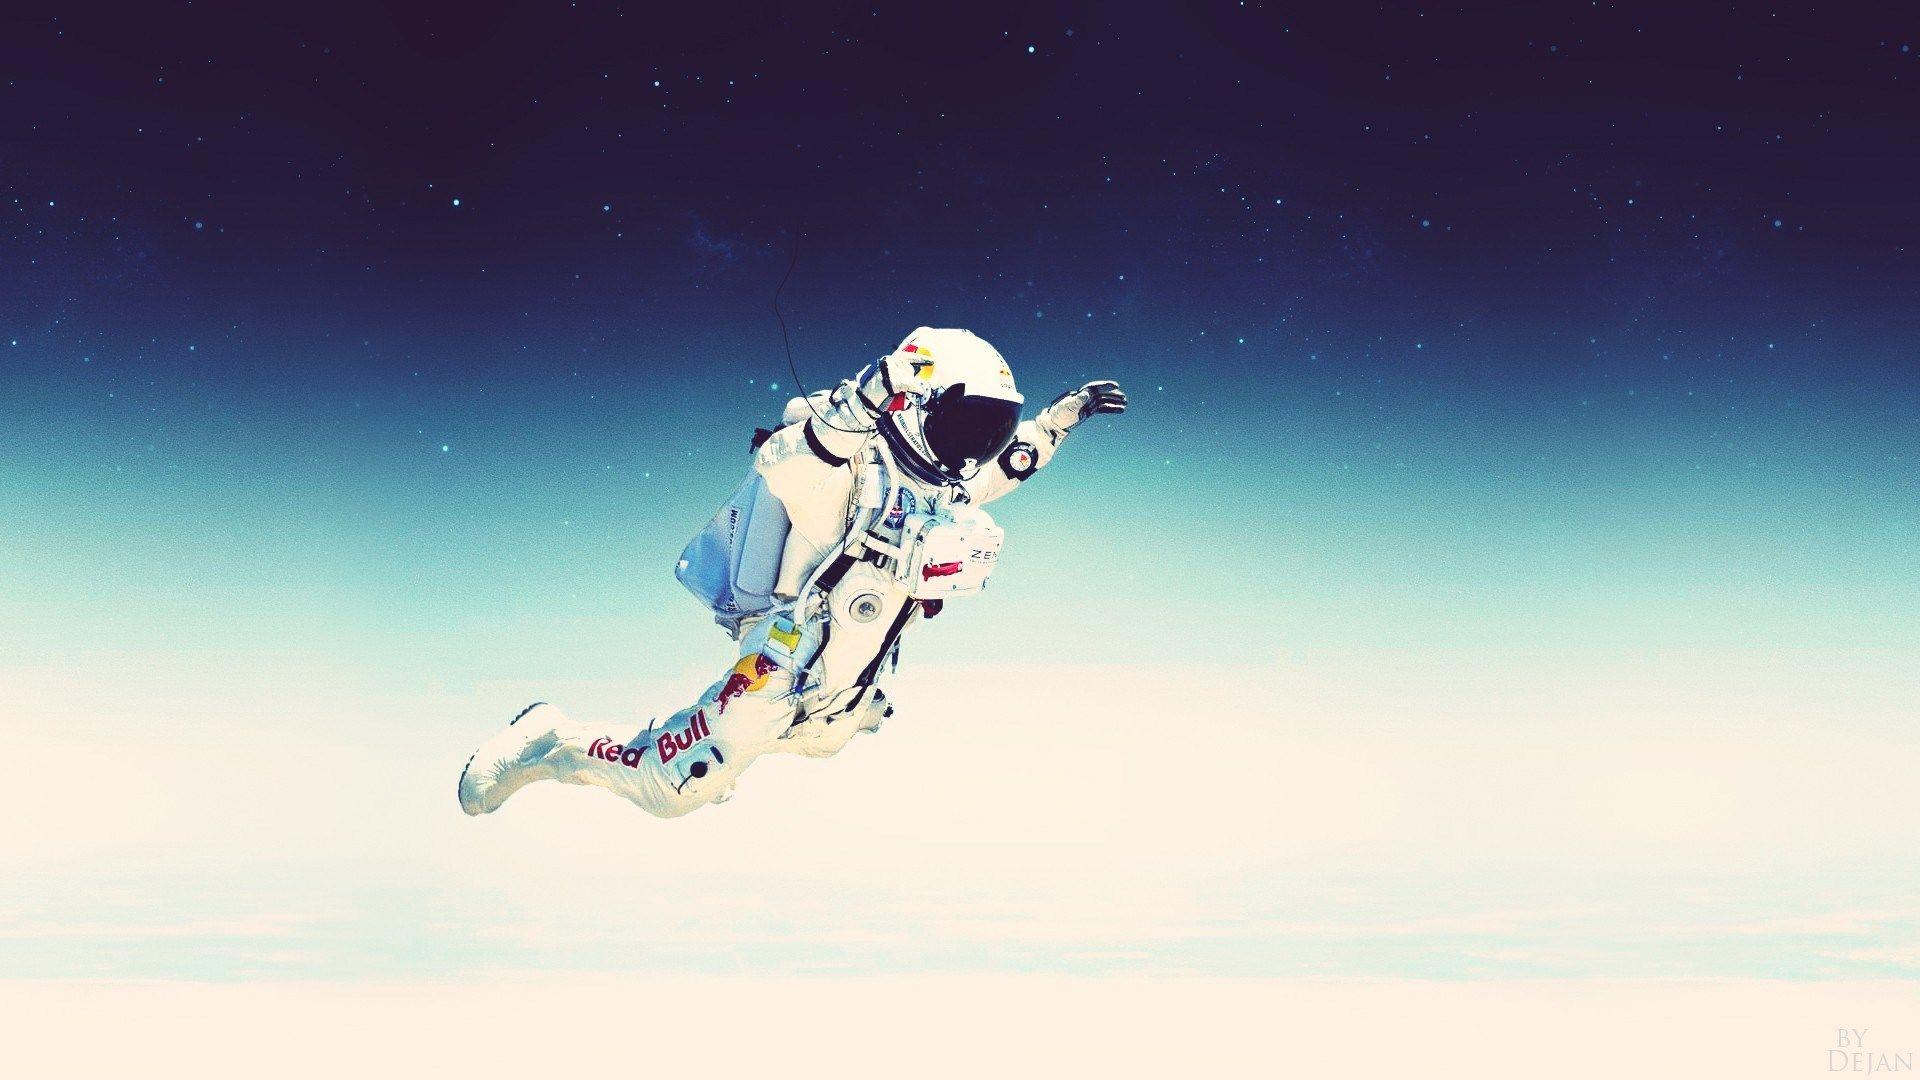 wallpapers free skydiving, 1920x1080 (224 kB)